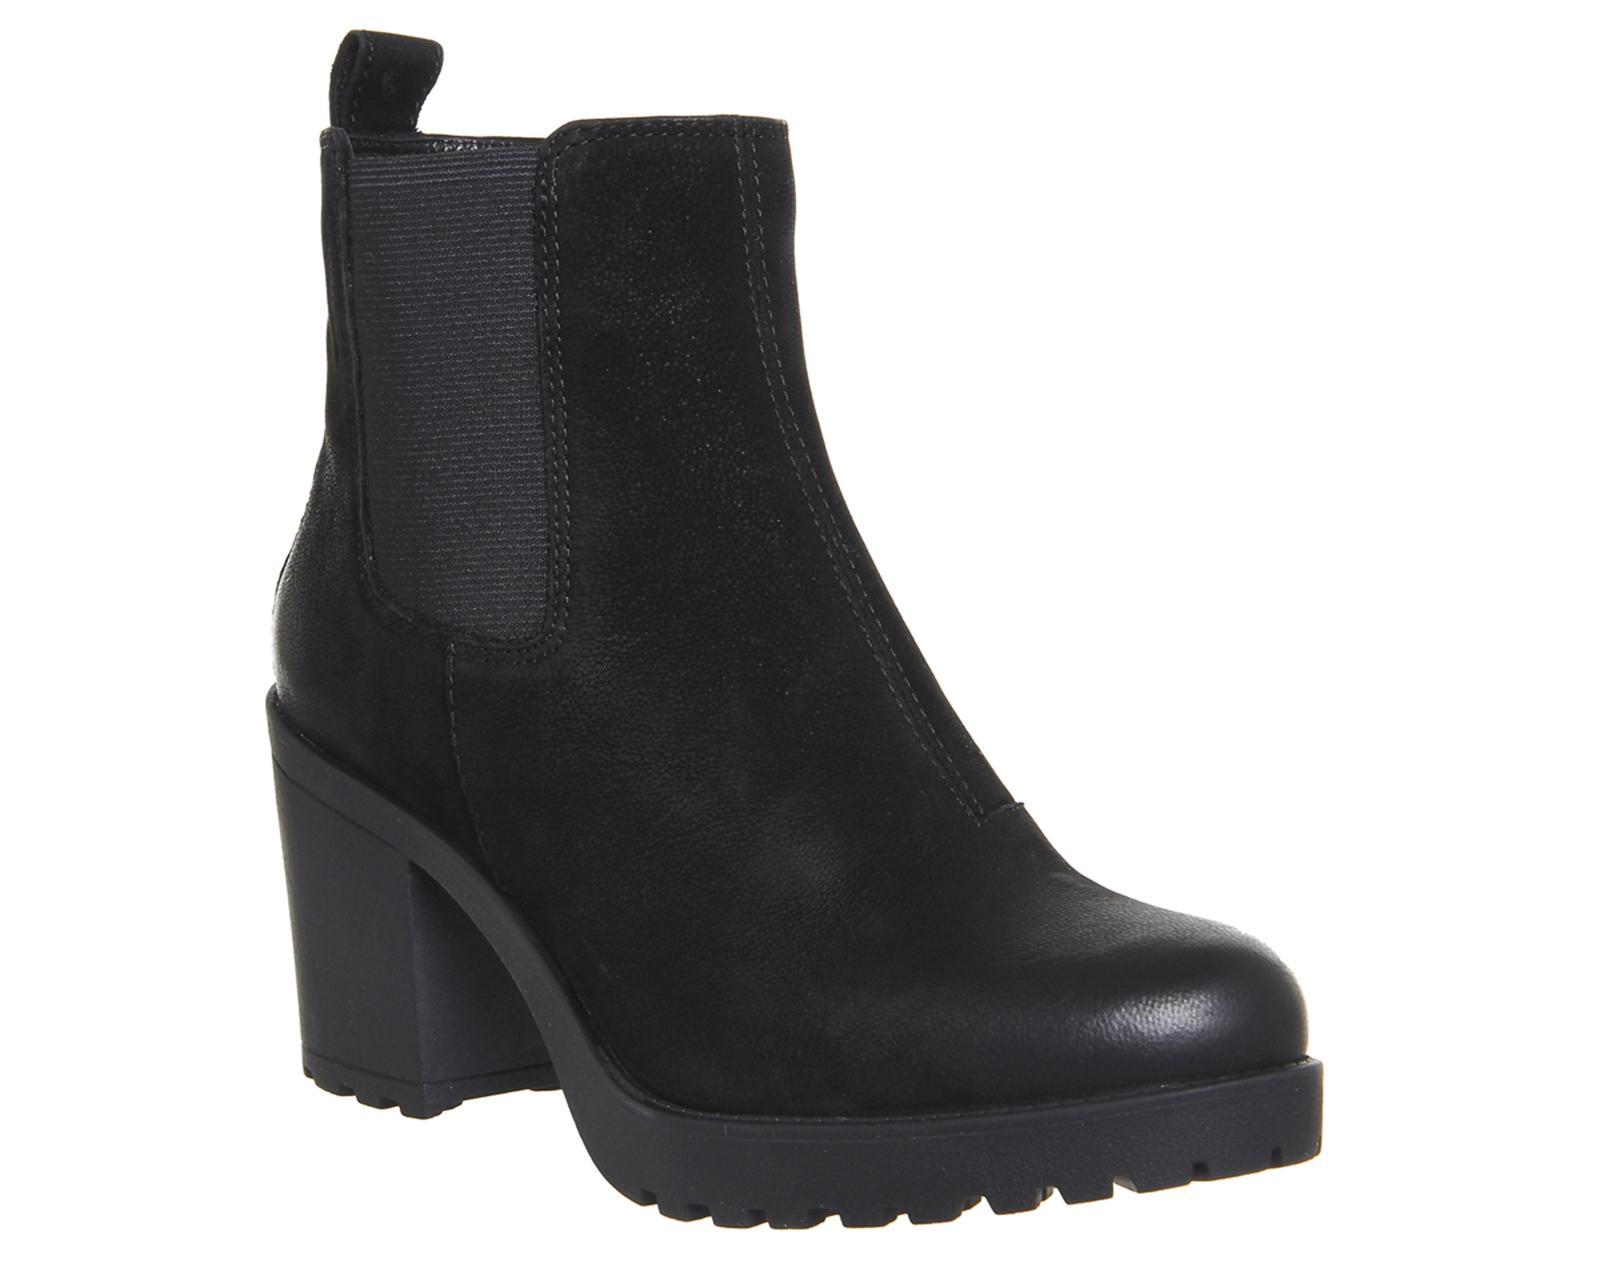 vagabond grace heeled chelsea boots in black lyst. Black Bedroom Furniture Sets. Home Design Ideas